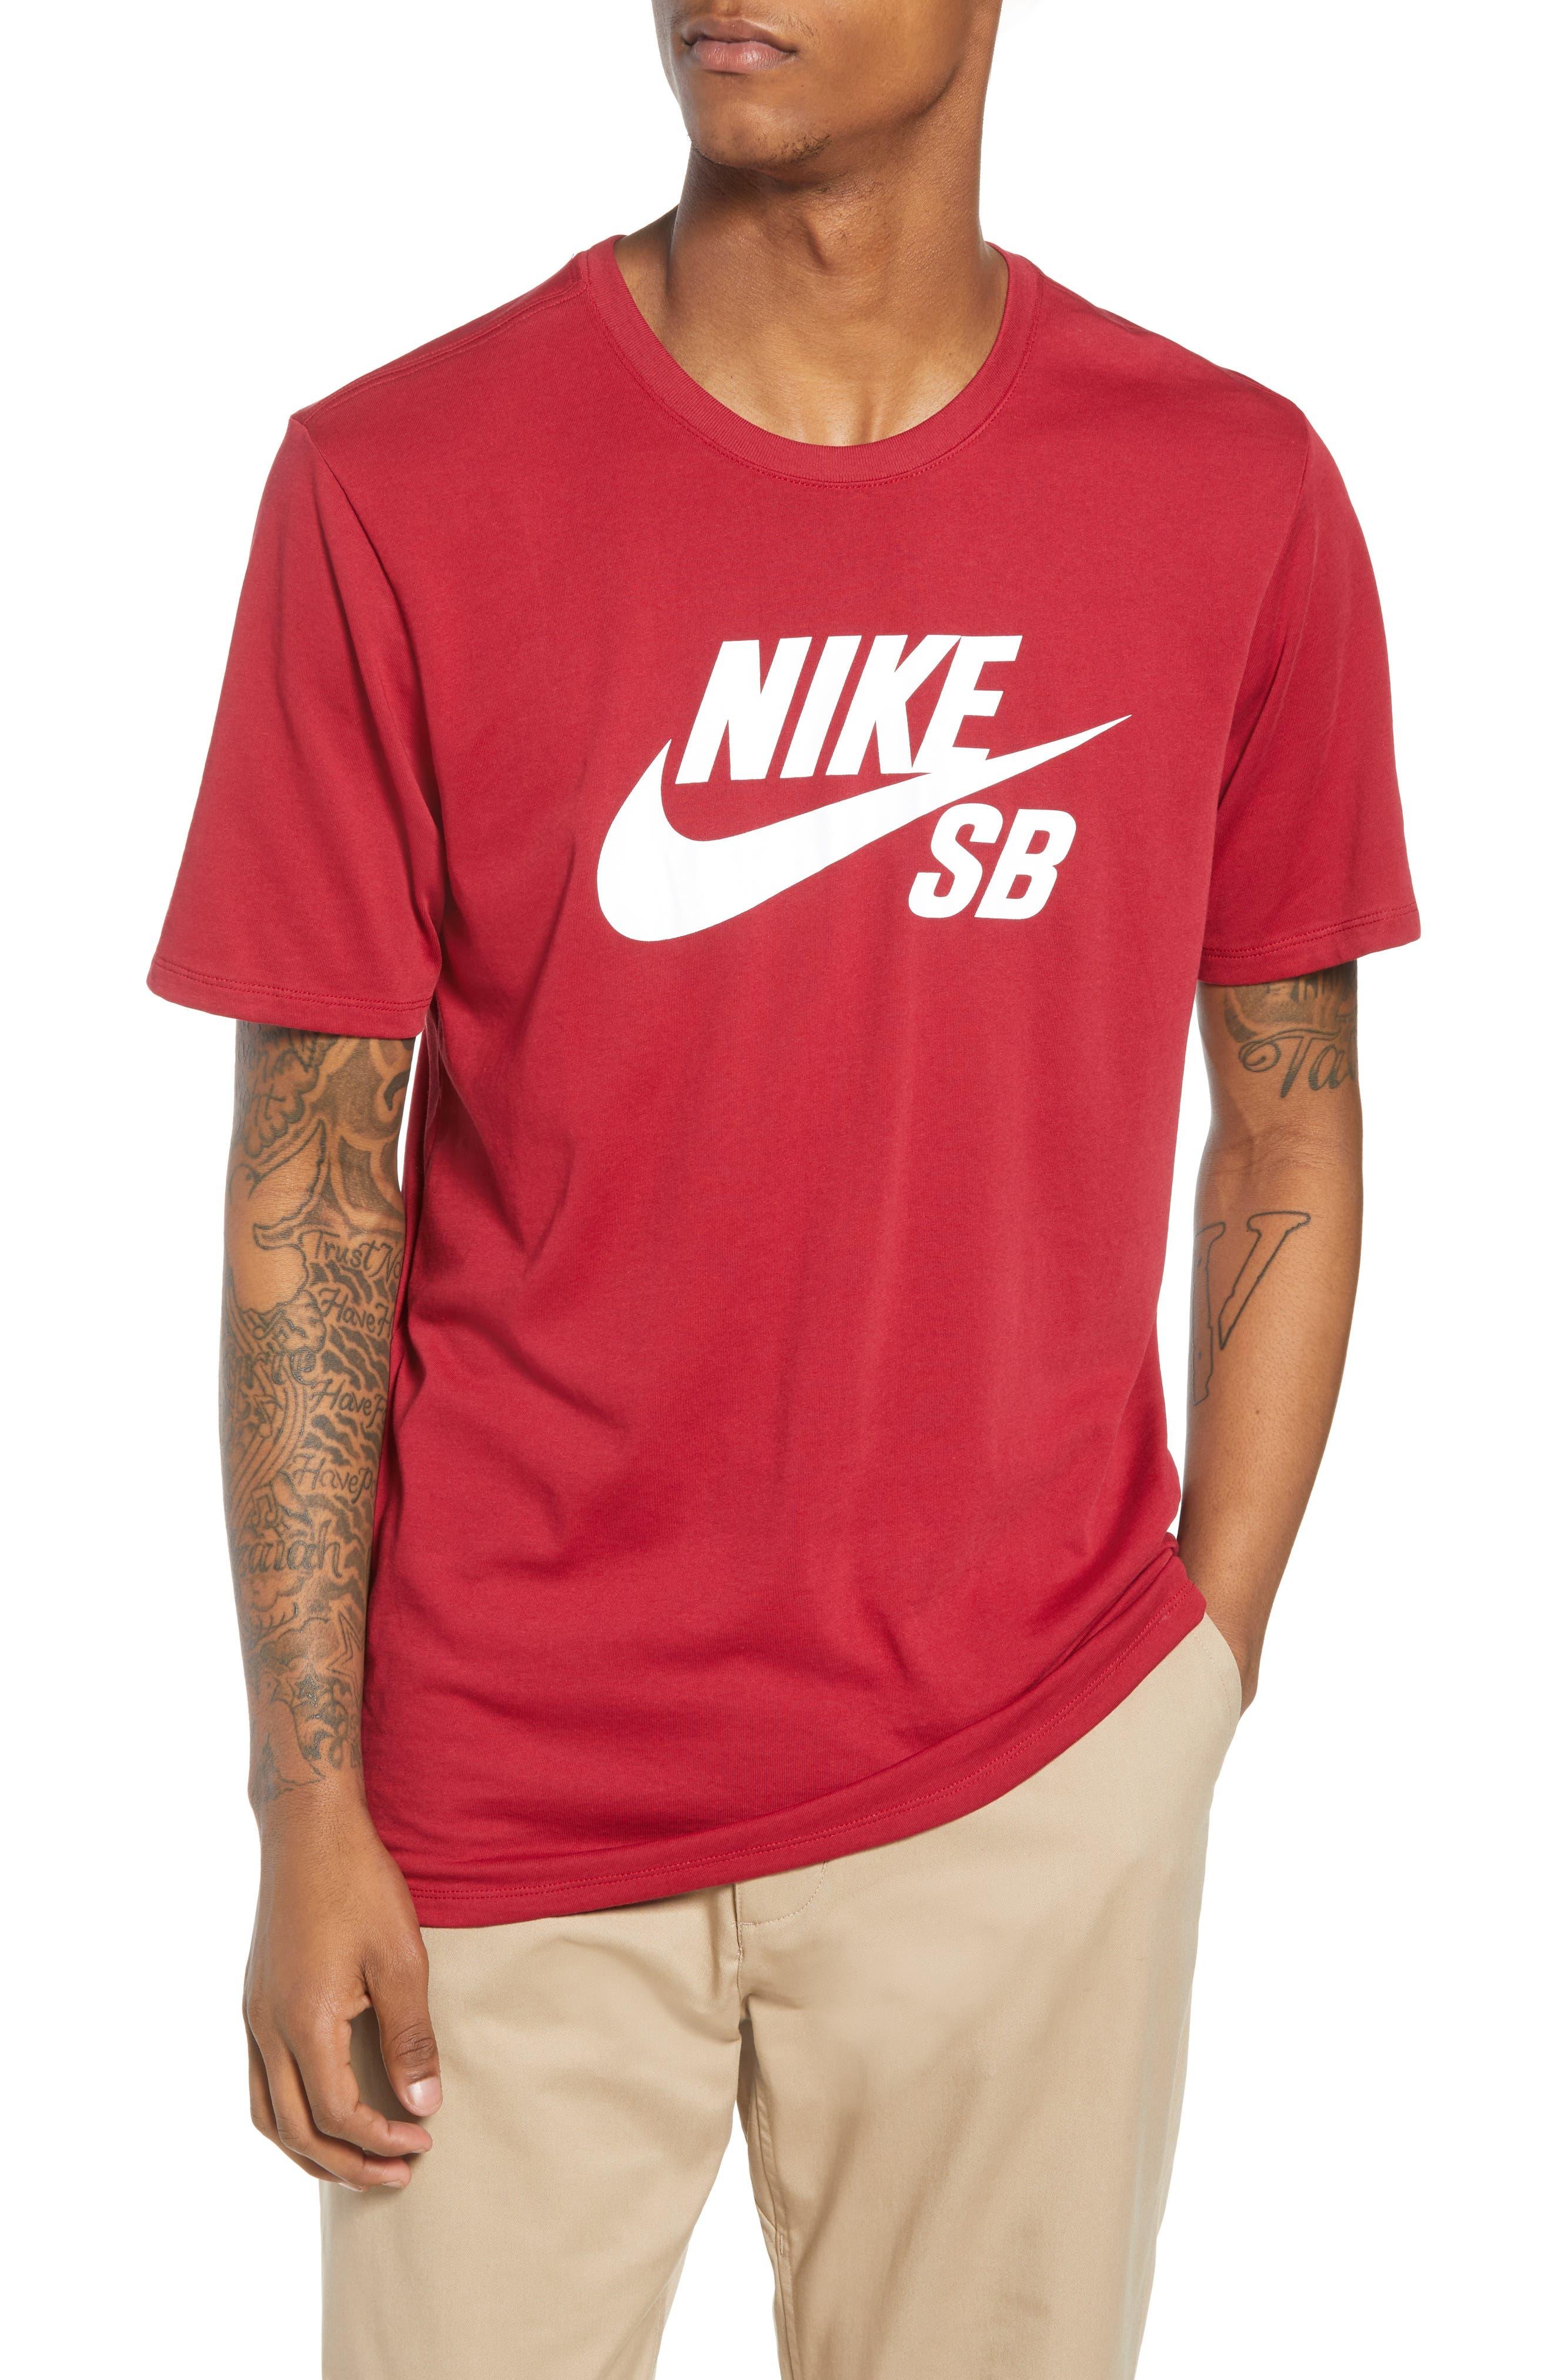 Nike 'SB Logo' T-Shirt,                         Main,                         color, Red Crush White